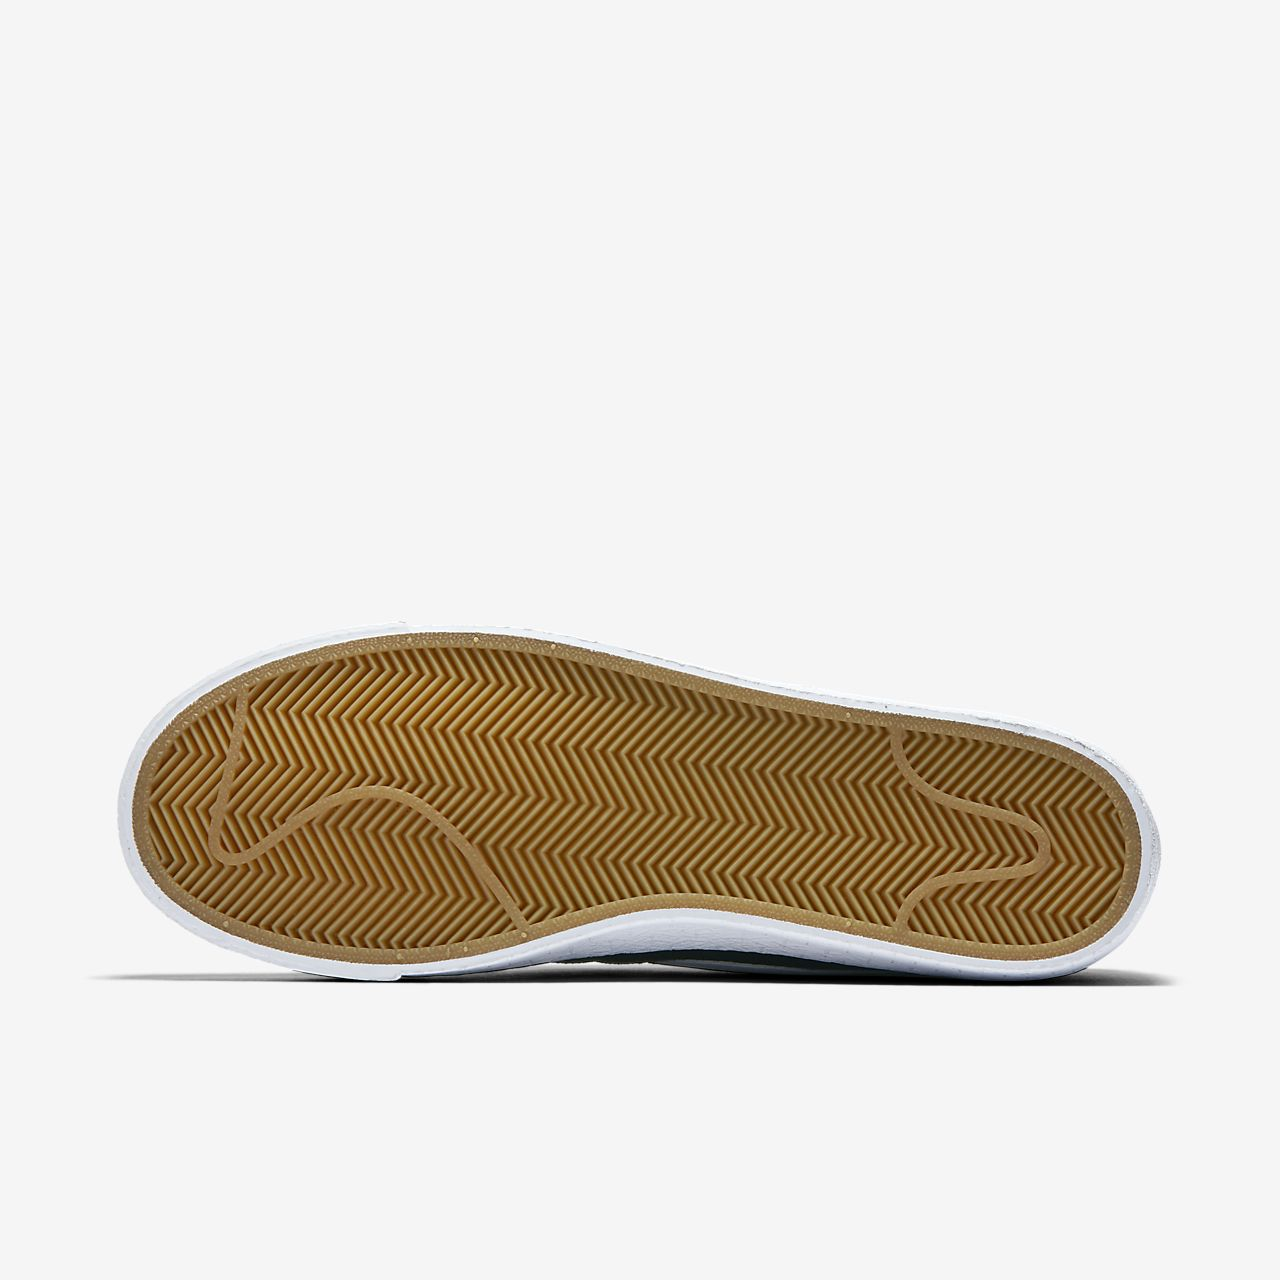 new style b1c34 59ebb ... Nike SB Blazer Zoom Low-skatersko til mænd